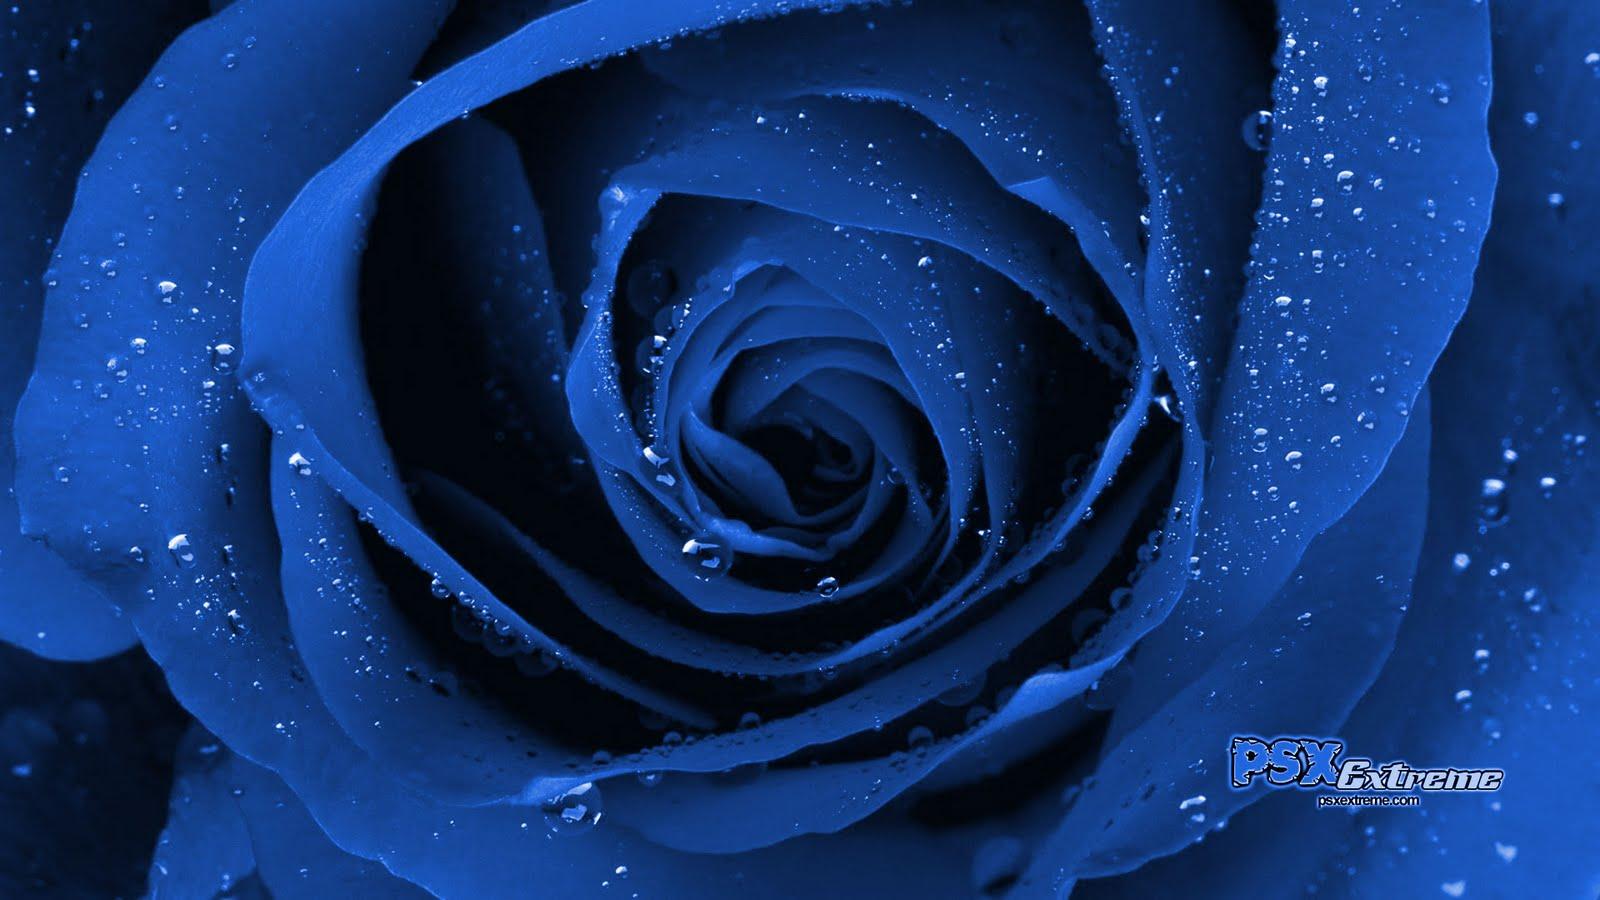 http://4.bp.blogspot.com/_NR-pTkG6FHE/S88Ar0pDiFI/AAAAAAAAASw/K2JMB5mKkck/s1600/blue_rose_01.jpg